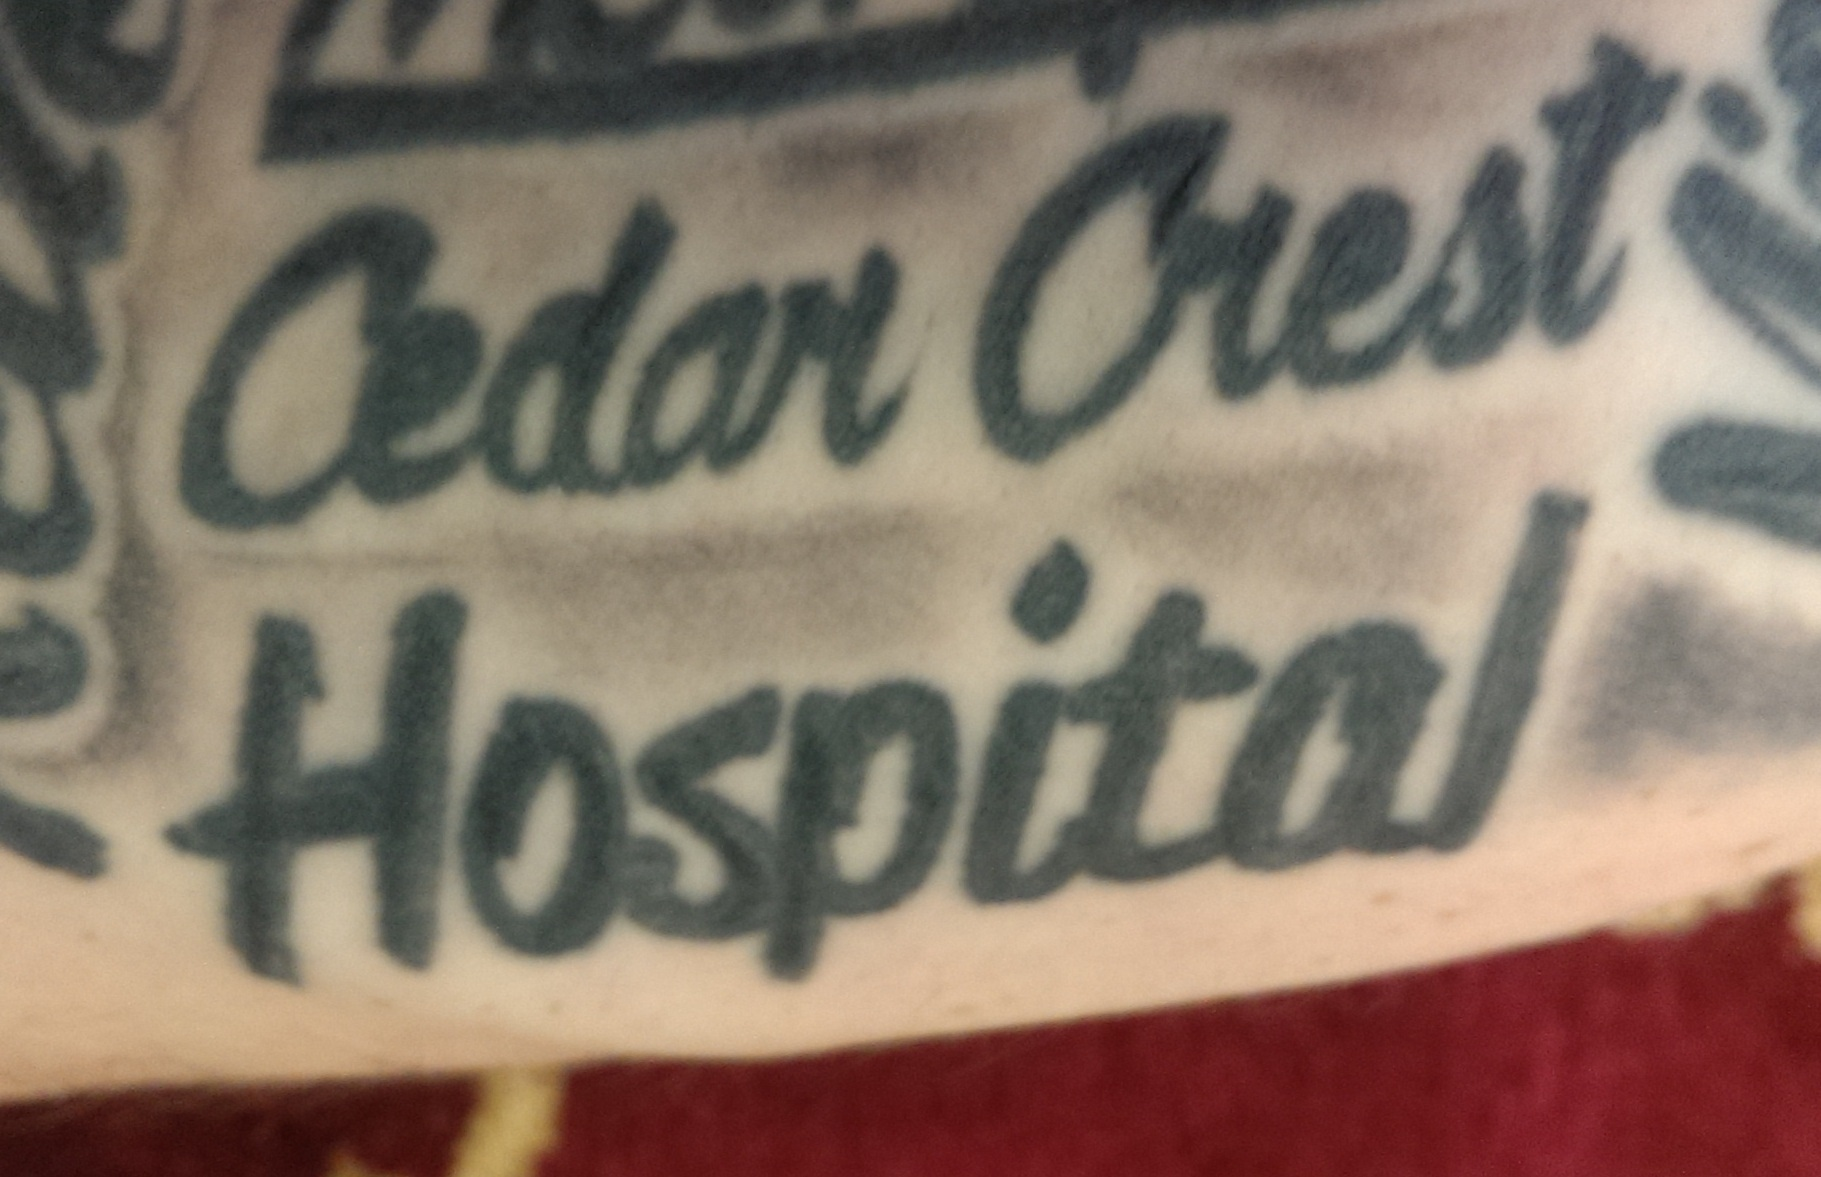 cedar crest Hospital doctor tattoo